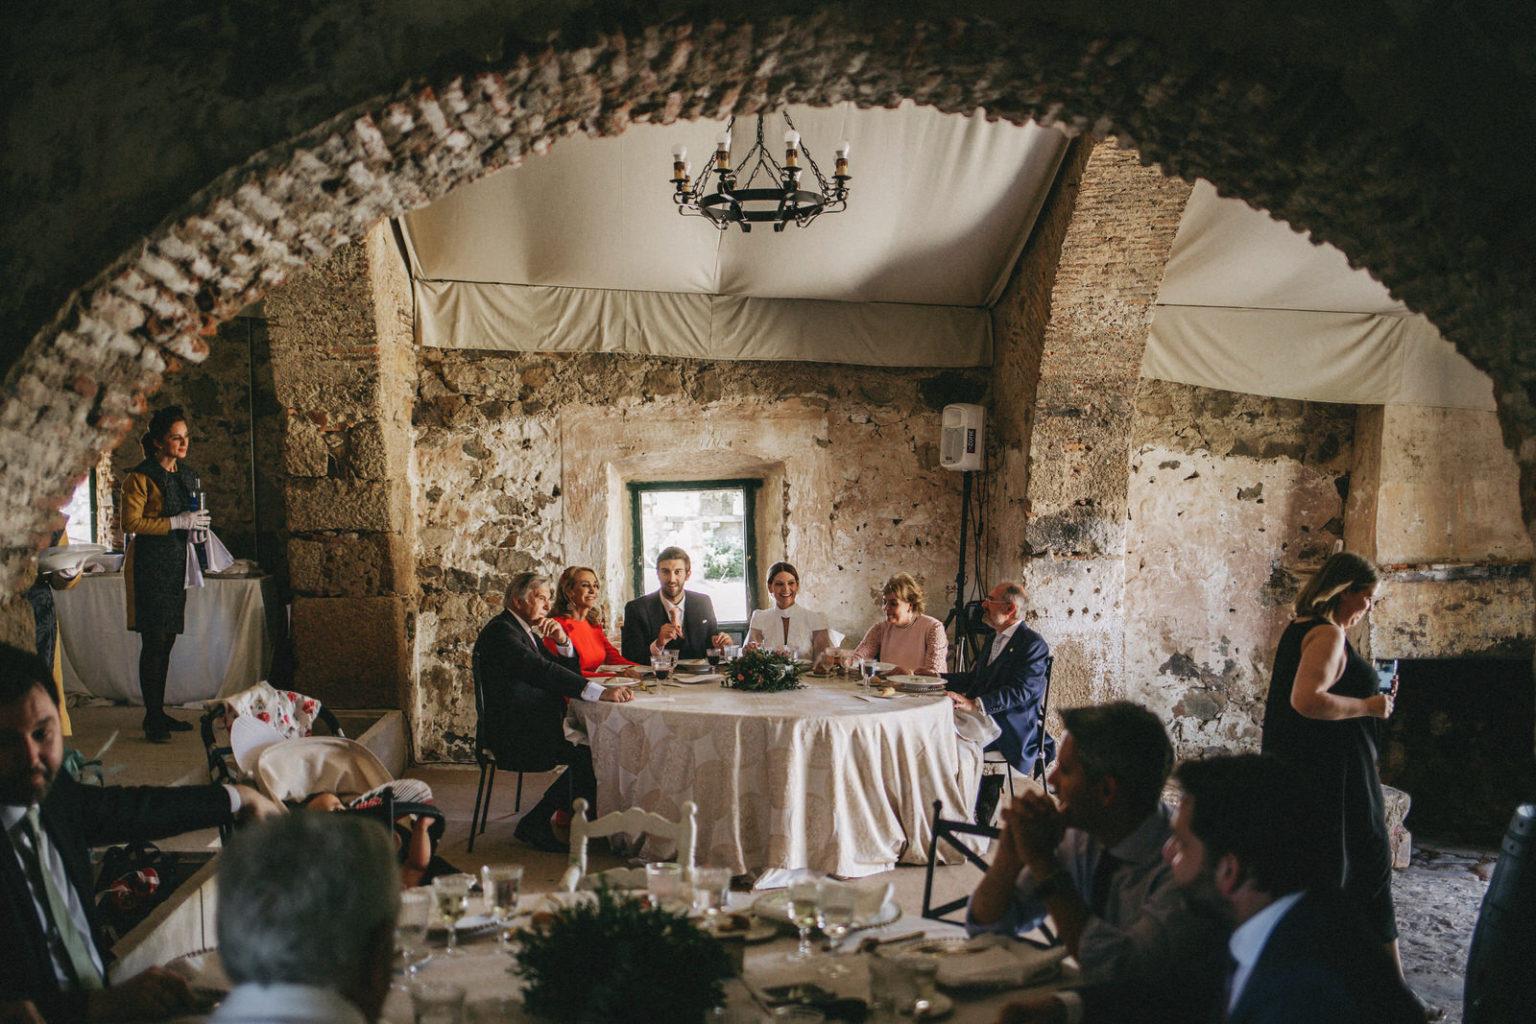 fotografo de boda en el Castillo de Cáceres, Boda Castillo de Cáceres, vídeo de boda, boda elegante, cuadriga, fotos boda natural